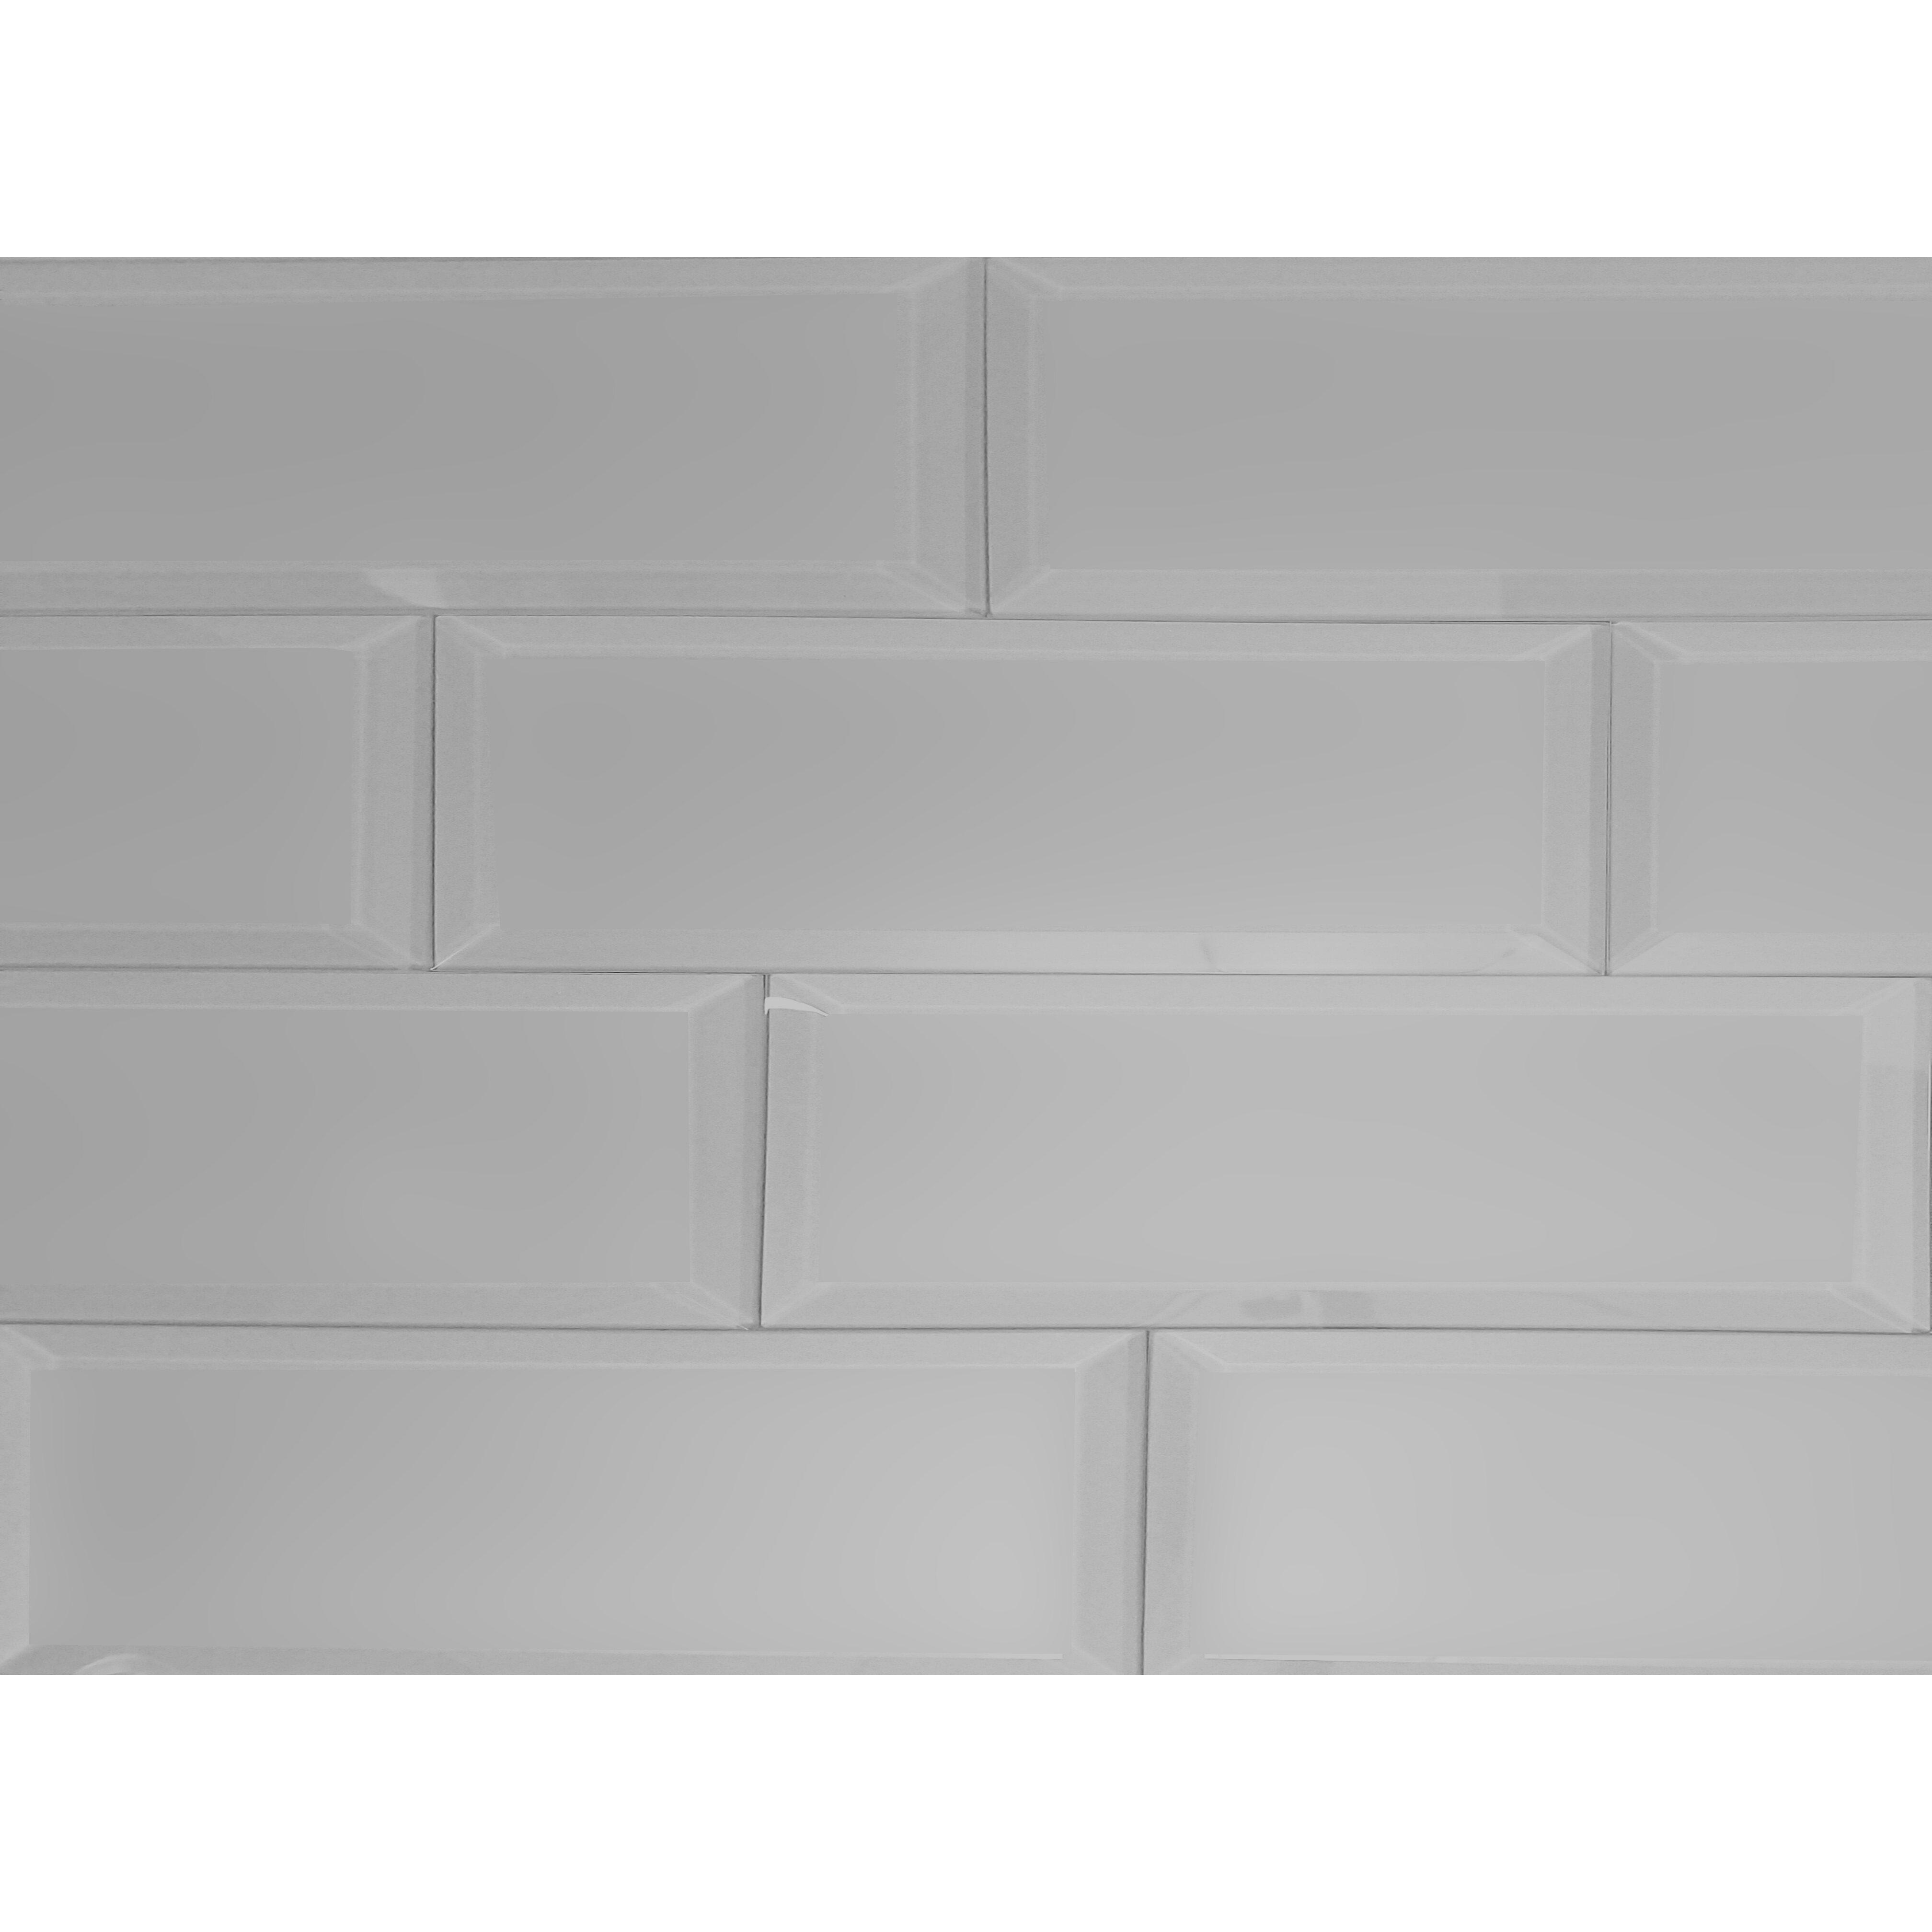 Famous 12X12 Floor Tiles Thick 16X16 Ceramic Tile Round 2X4 White Subway Tile 3 Tile Patterns For Floors Youthful 3D Ceramic Wall Tiles Red4X4 Ceramic Tile Dal Flooring Daltile Daltile Rittenhouse. . Kitchen Cabinets Painted ..